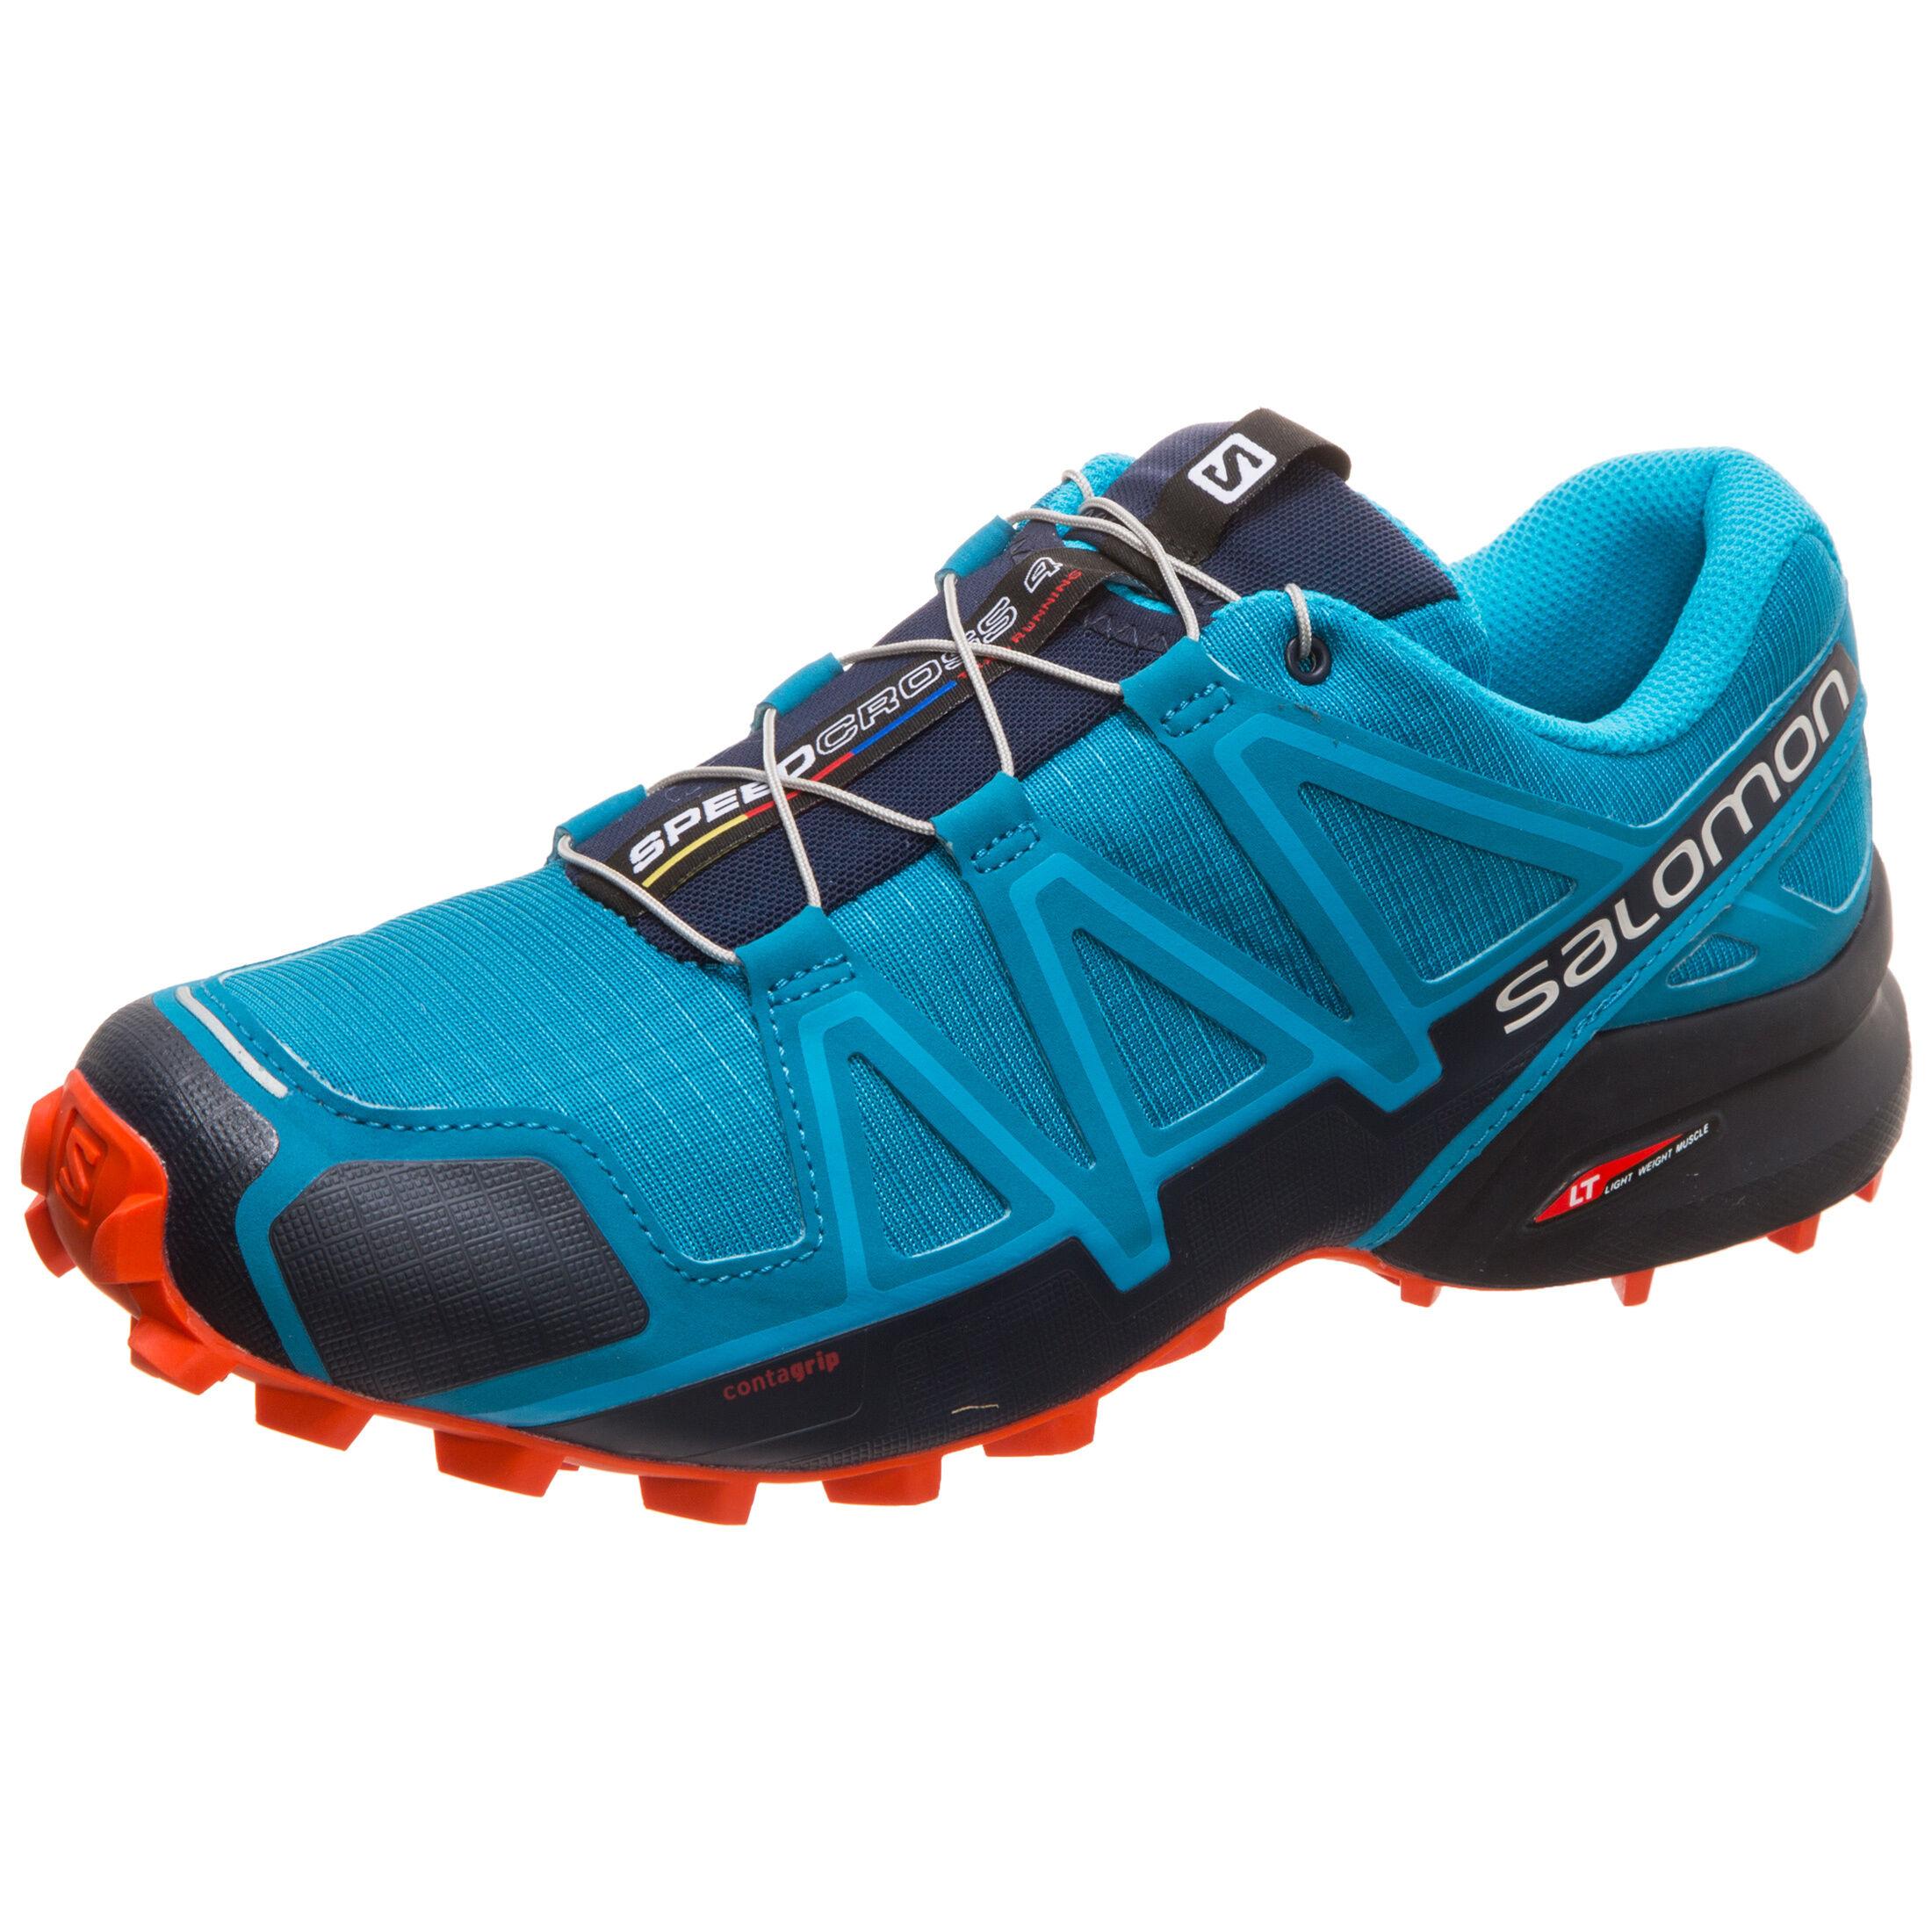 Trail SalomonLaufschuhe Schuhe Outfitter Kaufen Bei PkiXZuTO